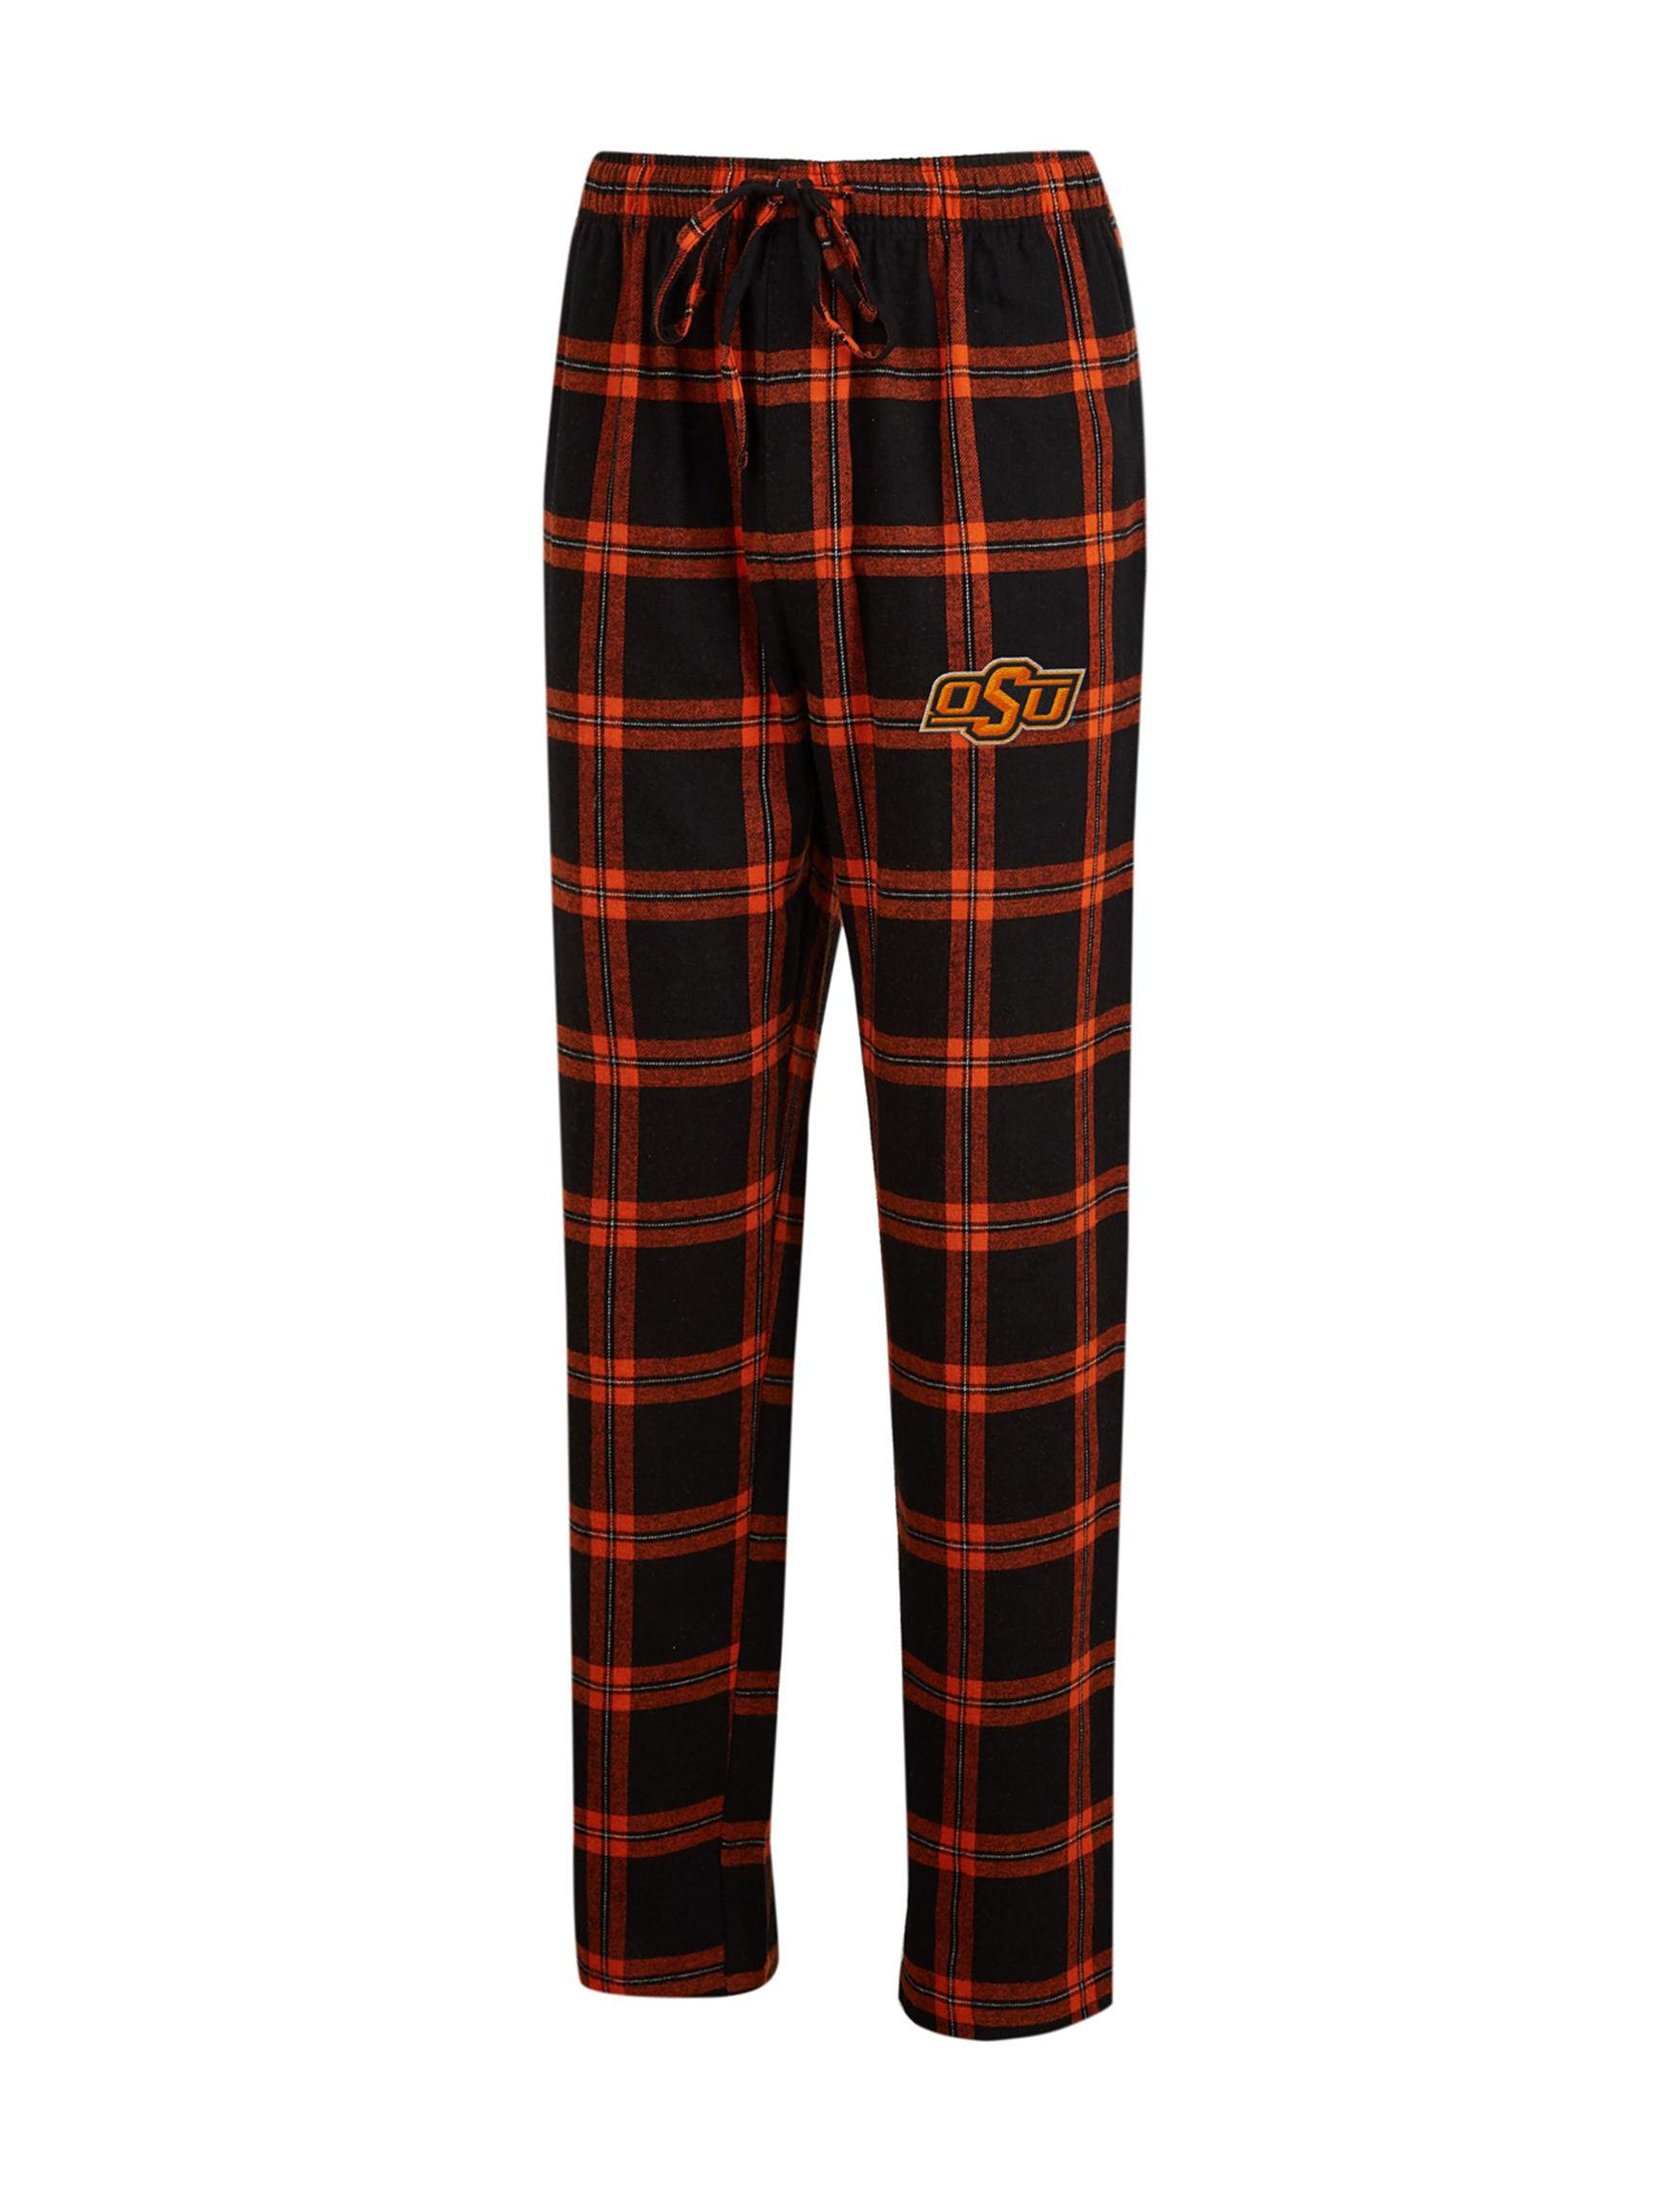 NCAA Black / Orange Pajama Bottoms